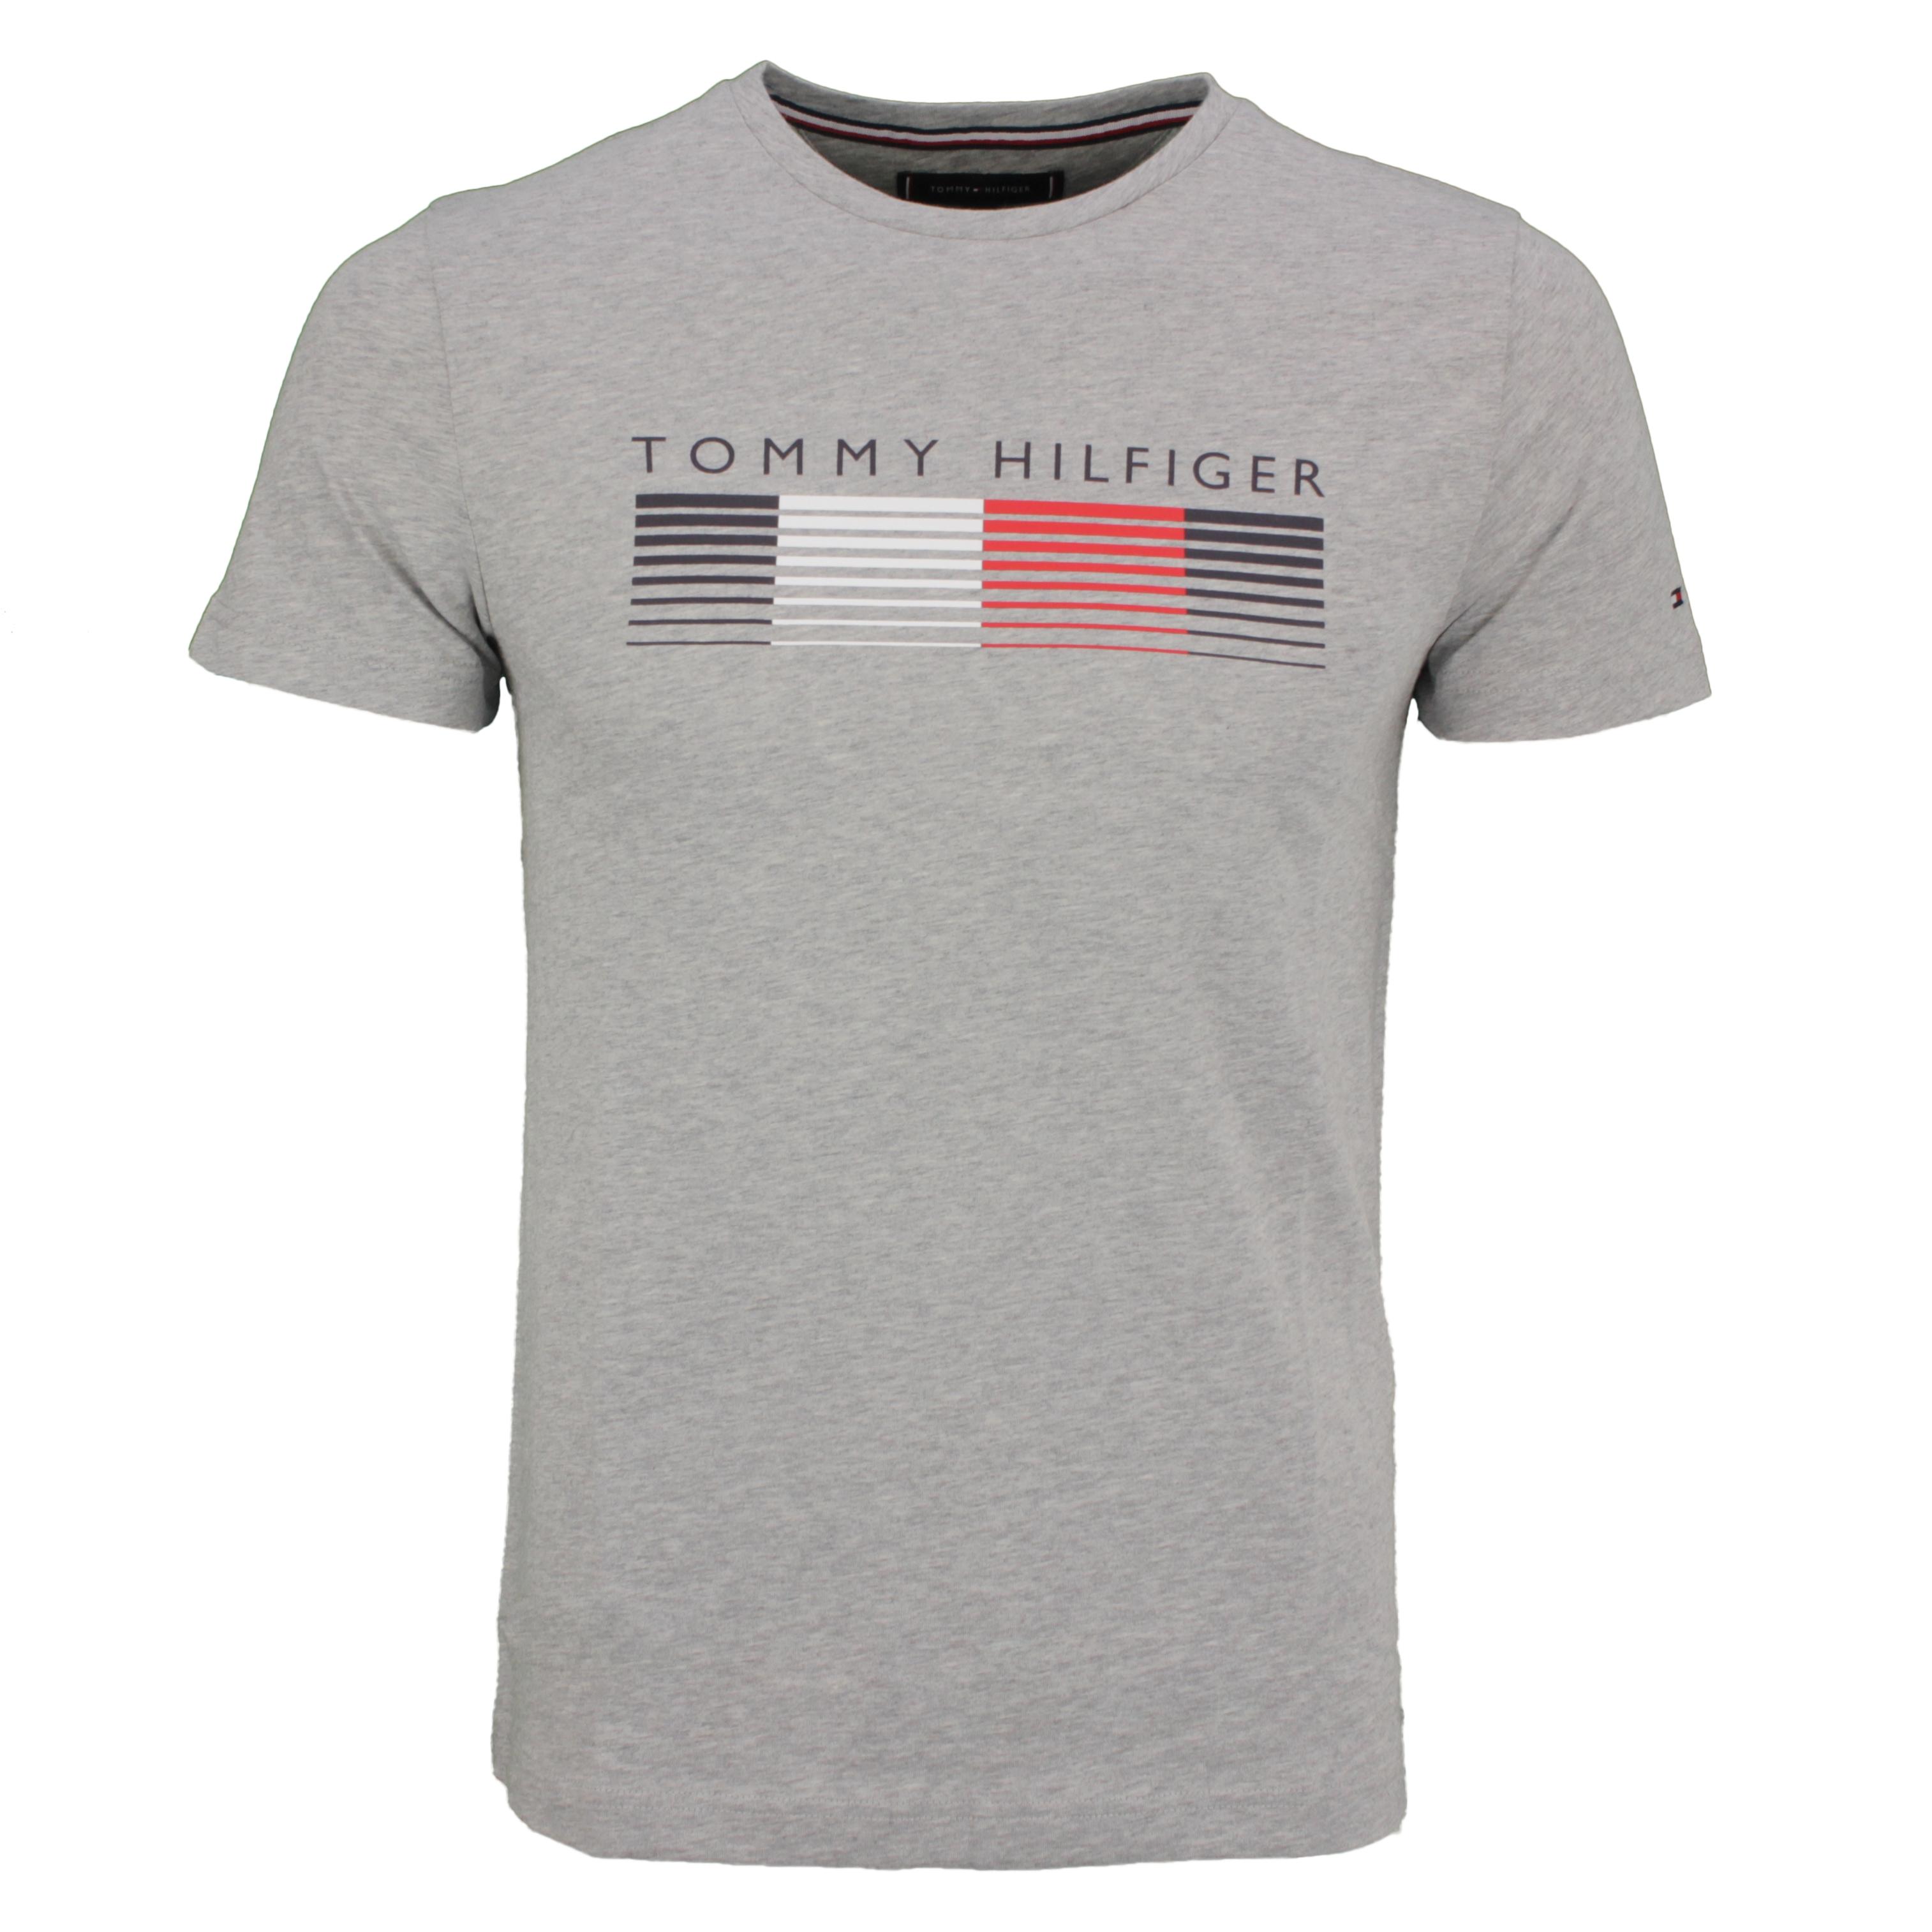 Tommy Hilfiger T-Shirt Shirt kurzarm Fade Graphic Corp Tee grau MW0MW21008 P91-GREY